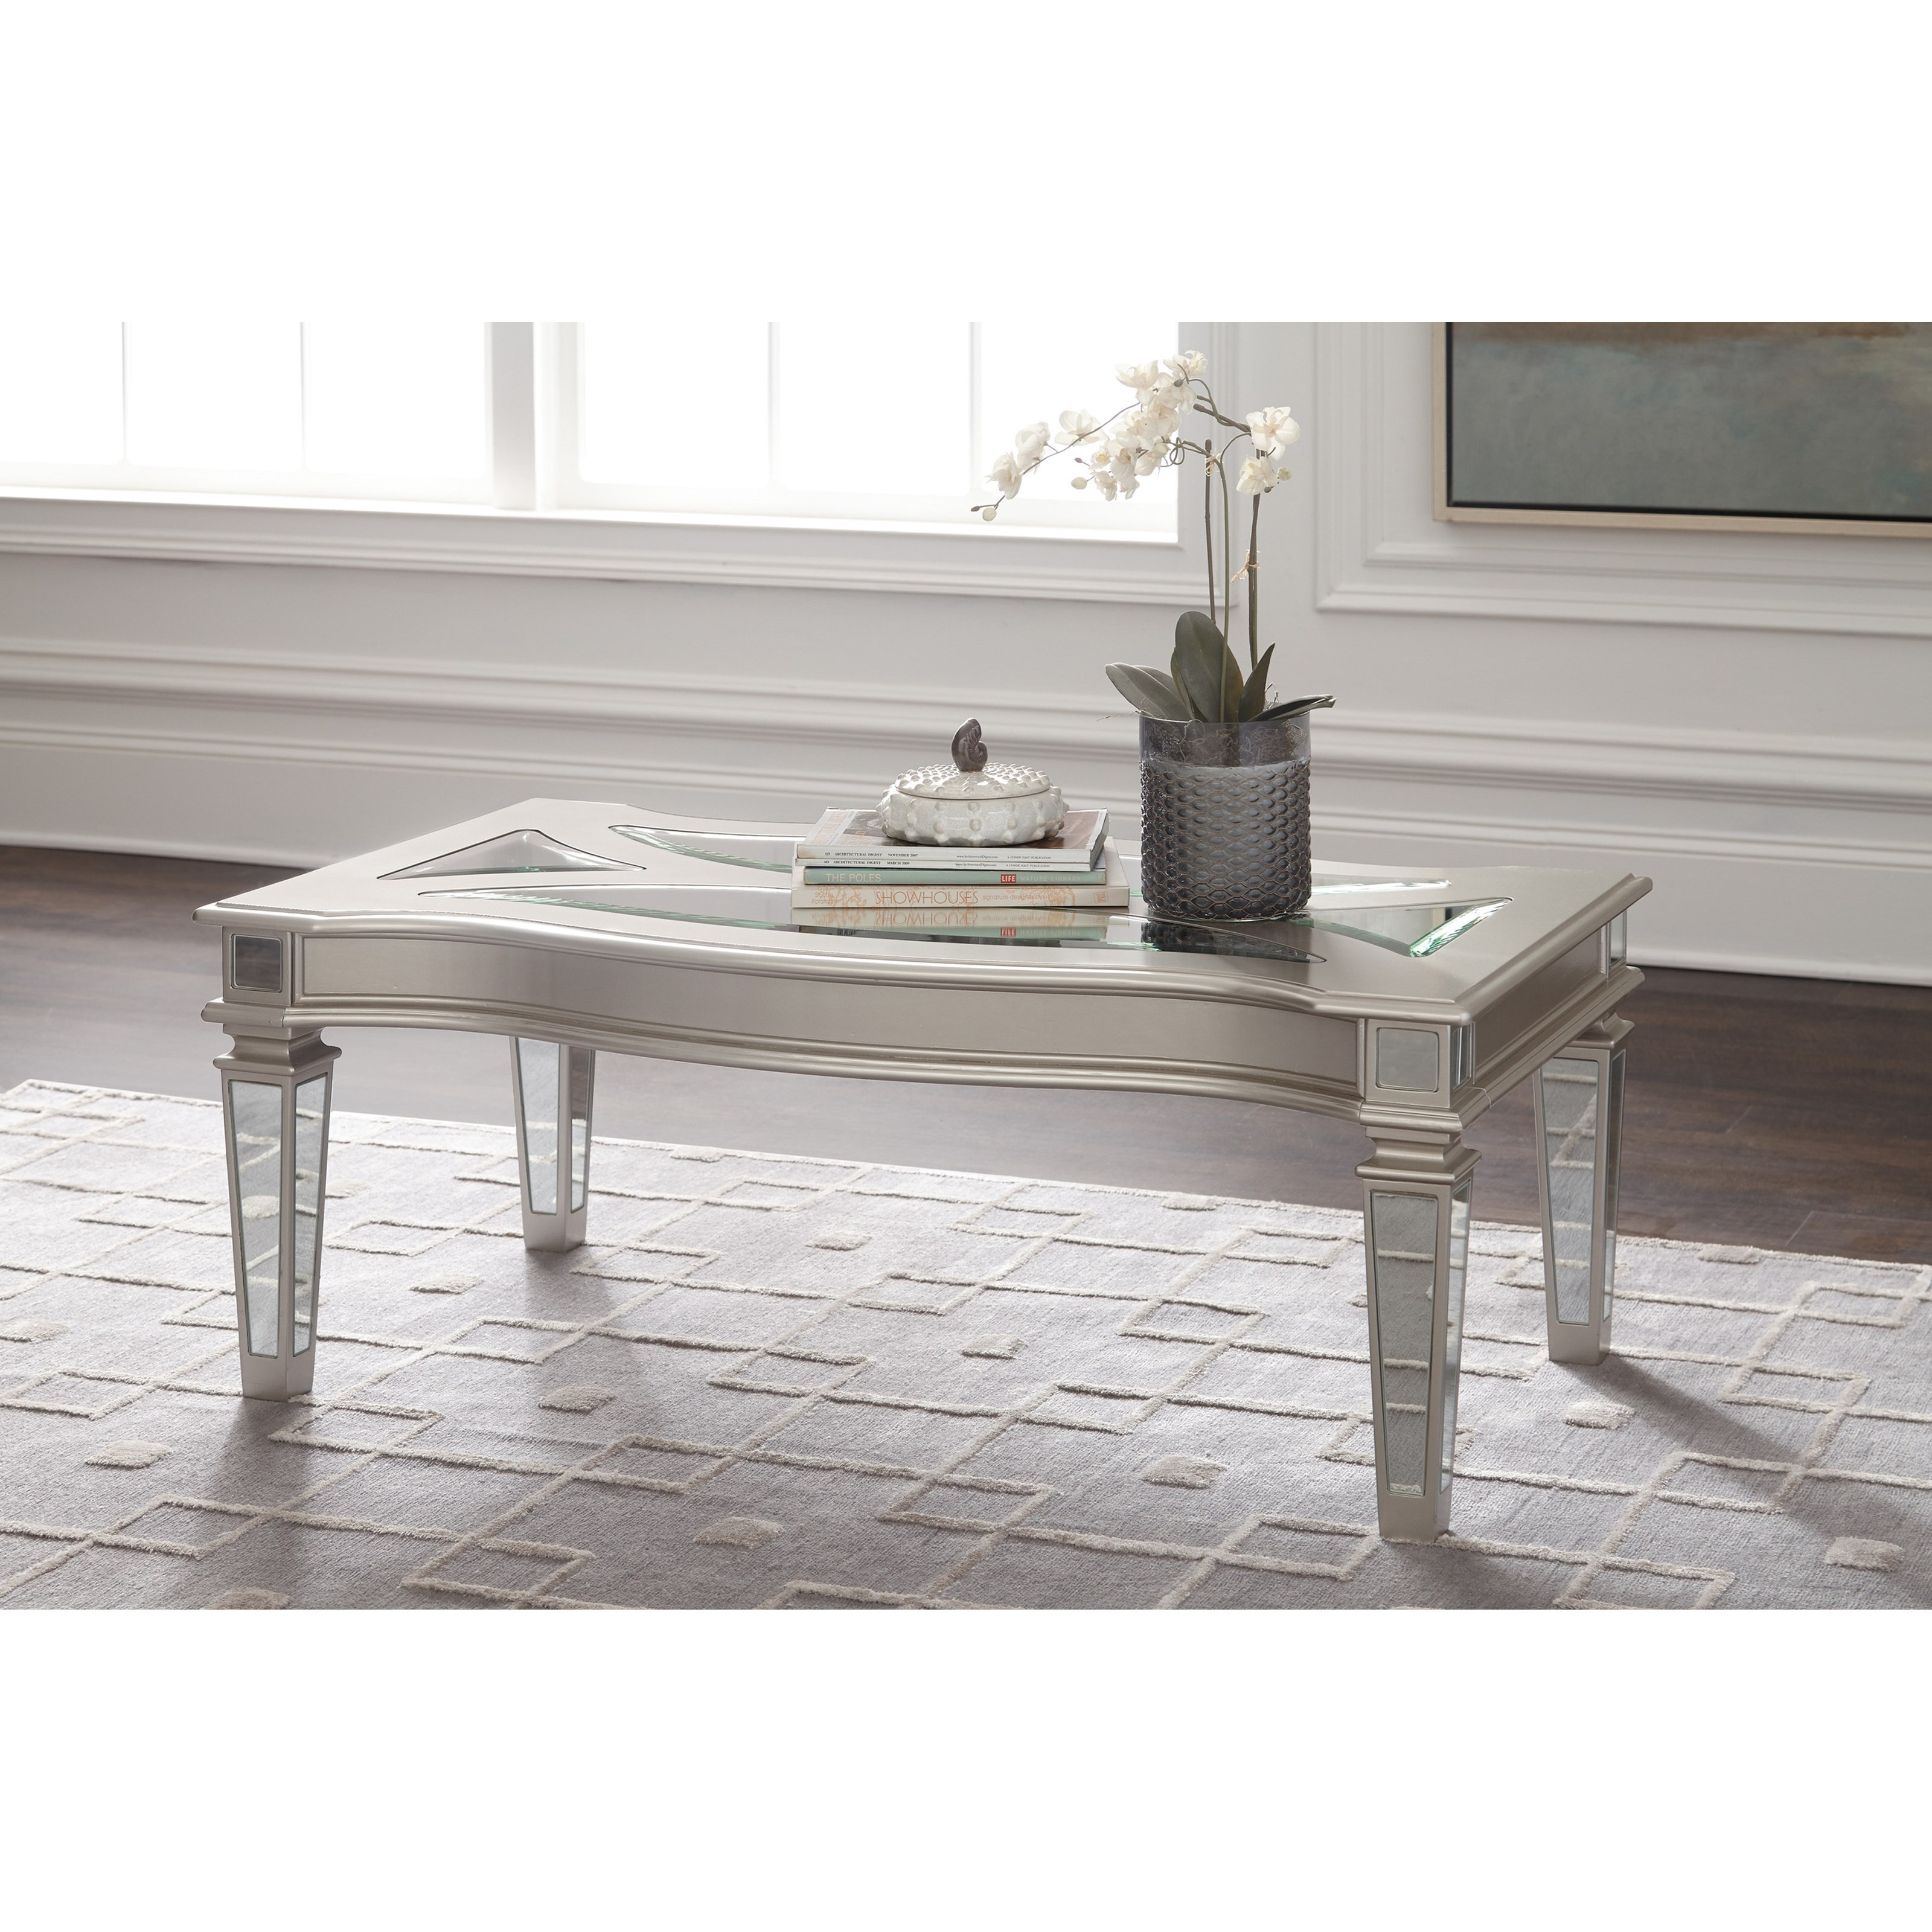 Hialeah Rectangle Coffee Table: Signature Design By Ashley Tessani T099-1 Silver Finish